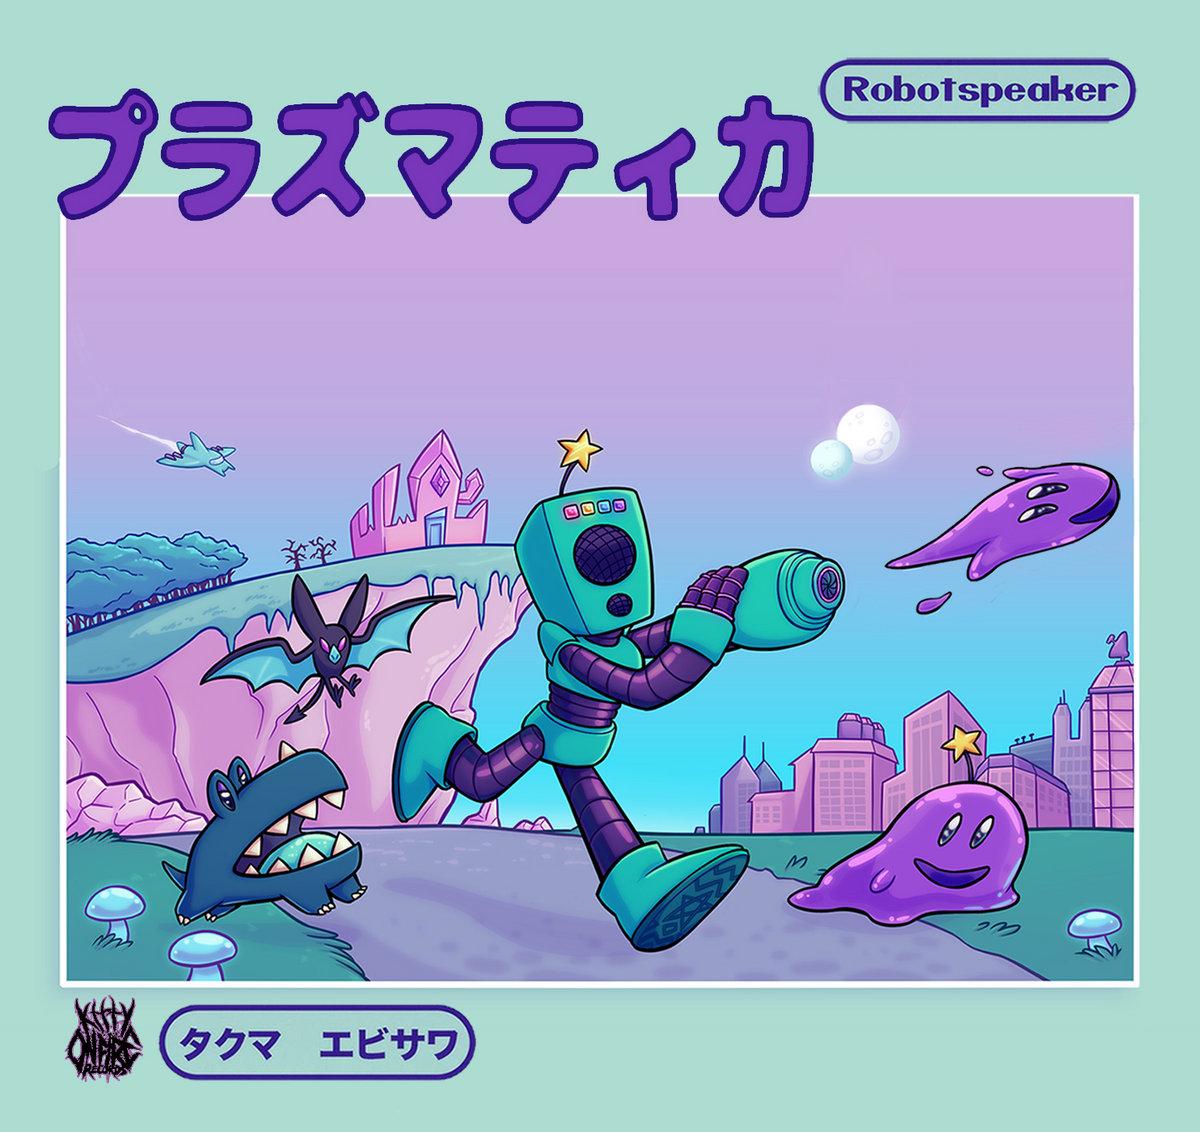 Robot Speaker – Plasmatica